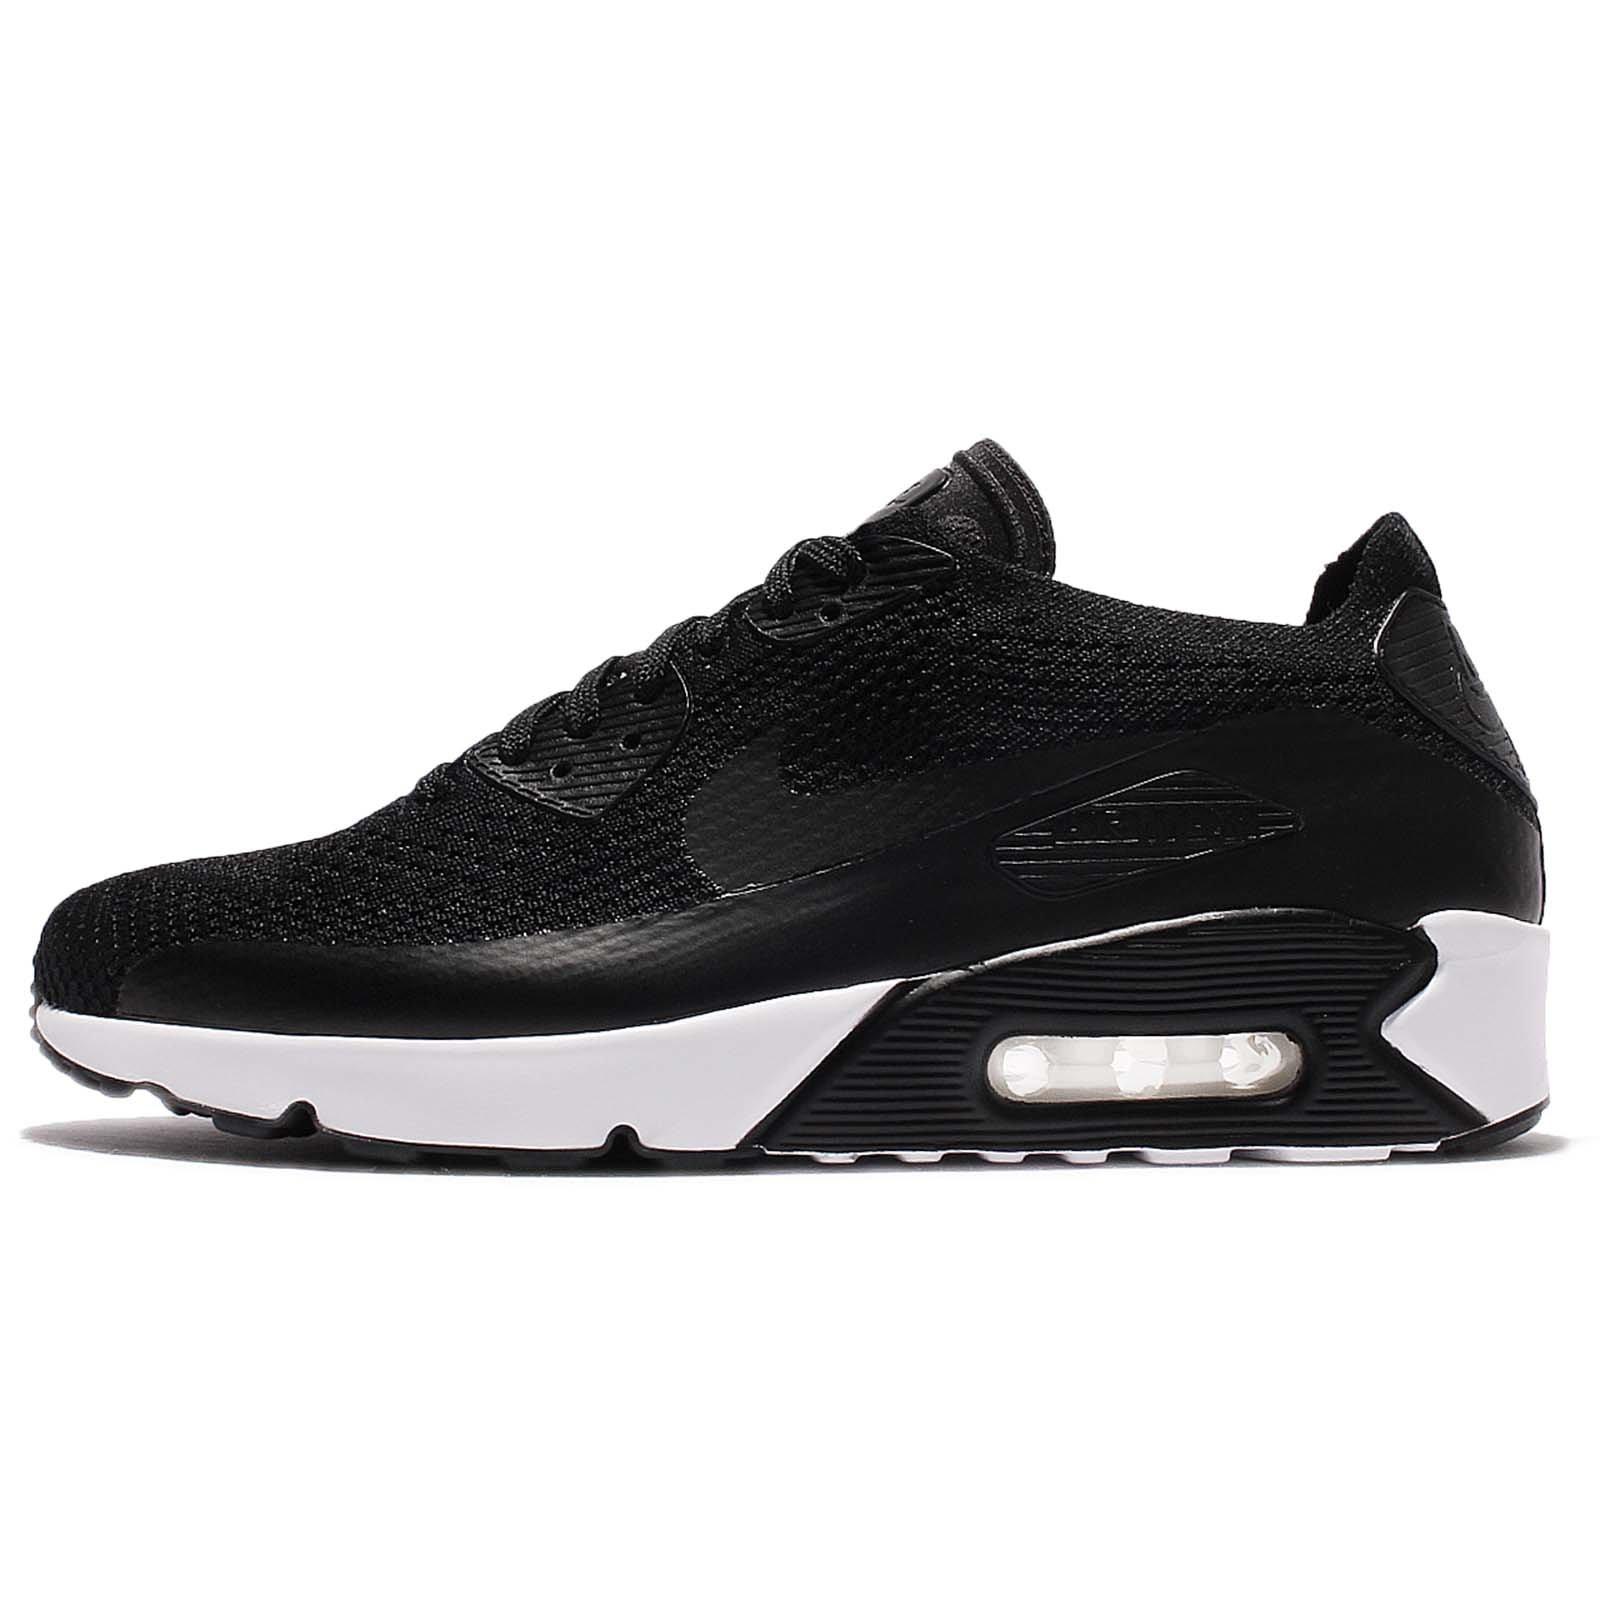 Nike AIR MAX 90 Ultra 2.0 Flyknit Triple Black White Mens Running 875943 004